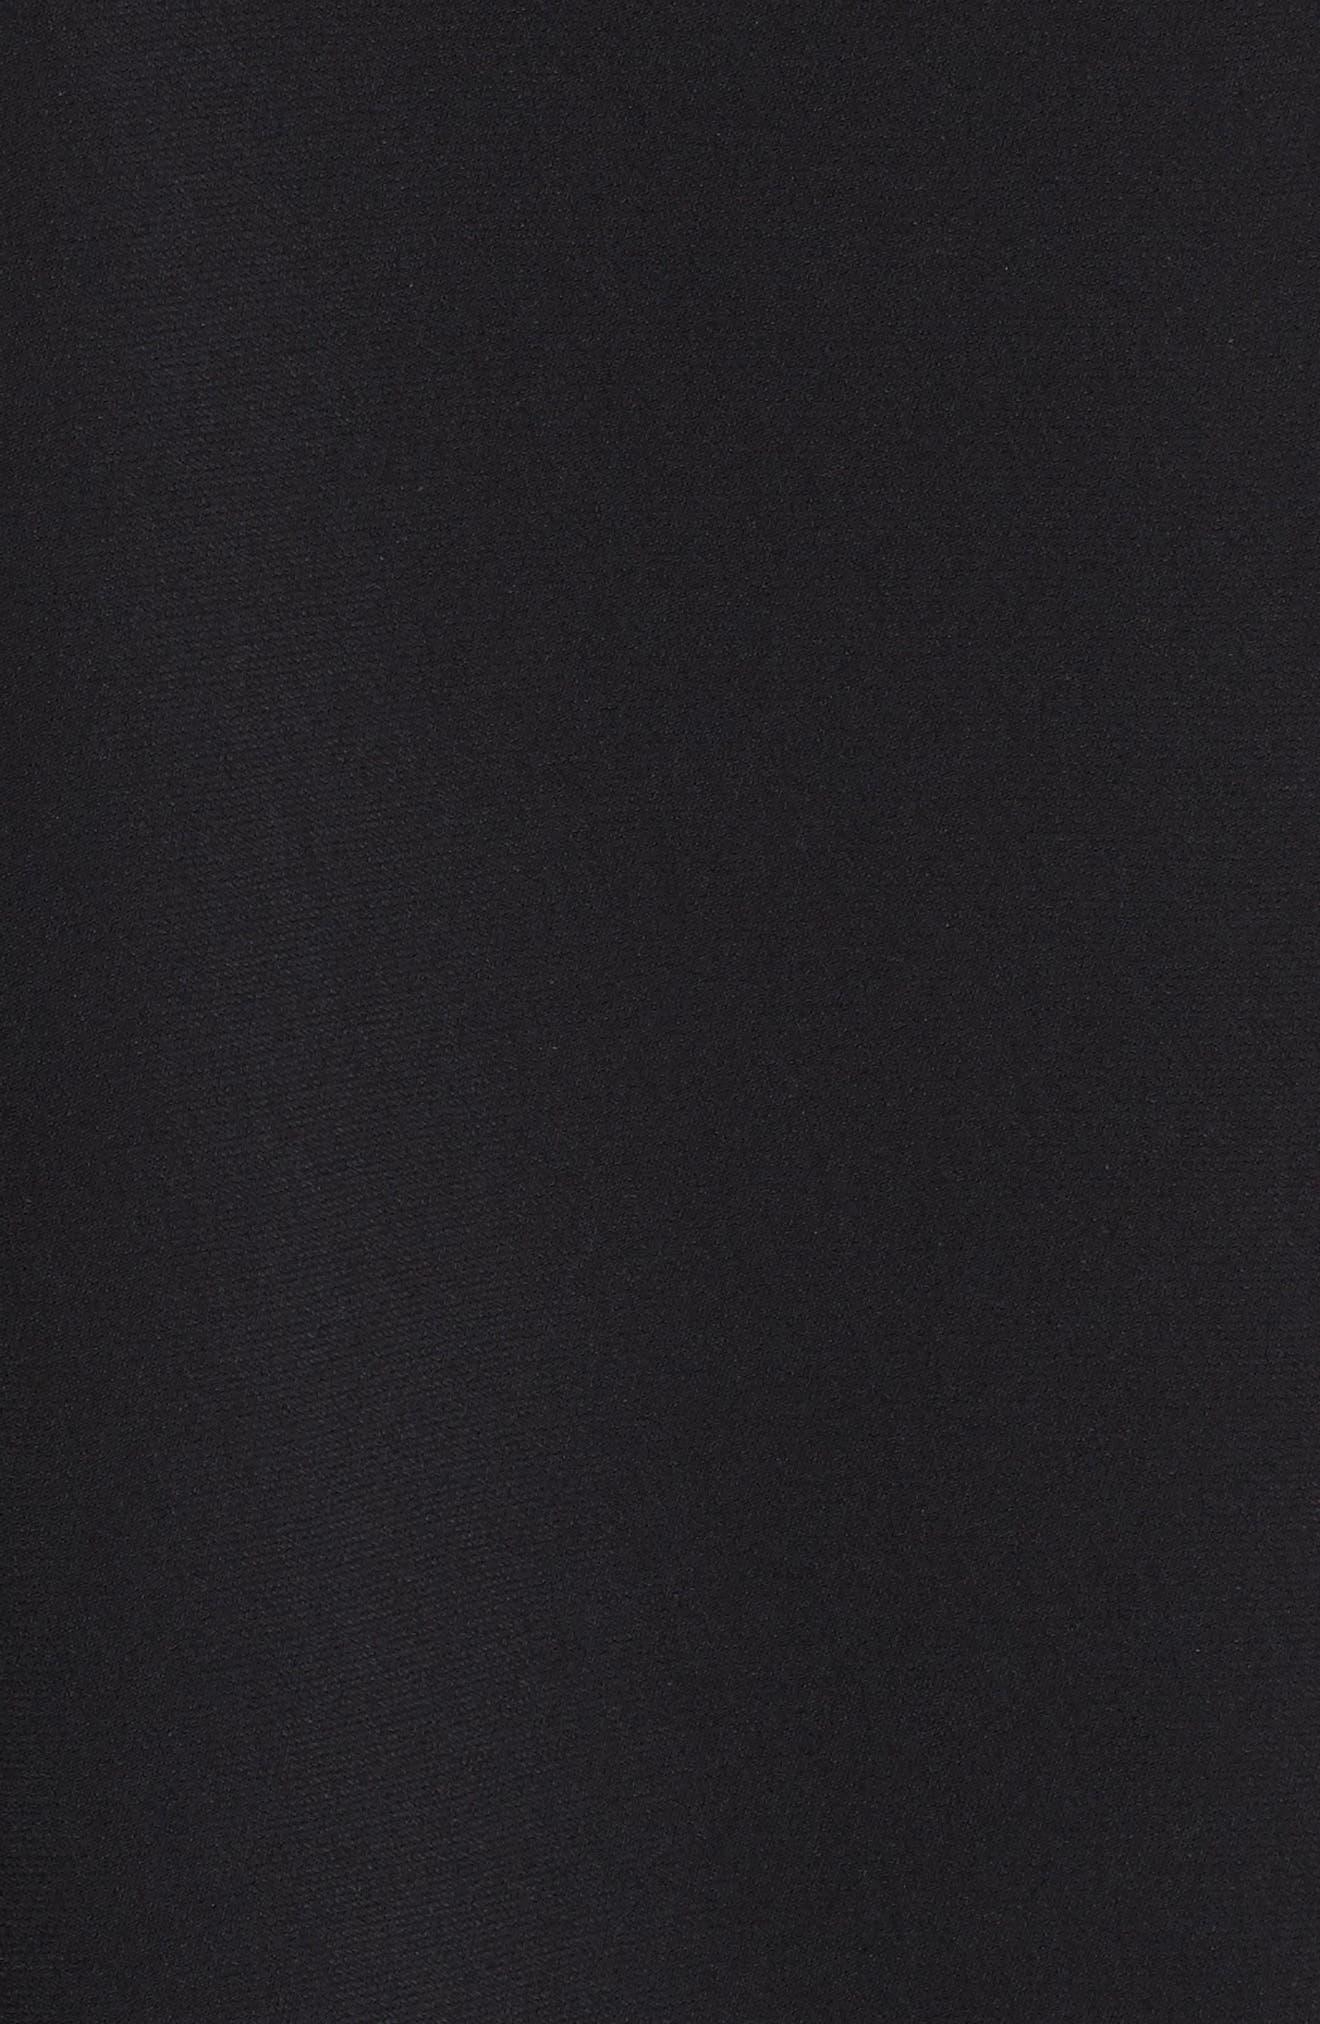 Stretch Cady One-Shoulder Cape Gown,                             Alternate thumbnail 5, color,                             001